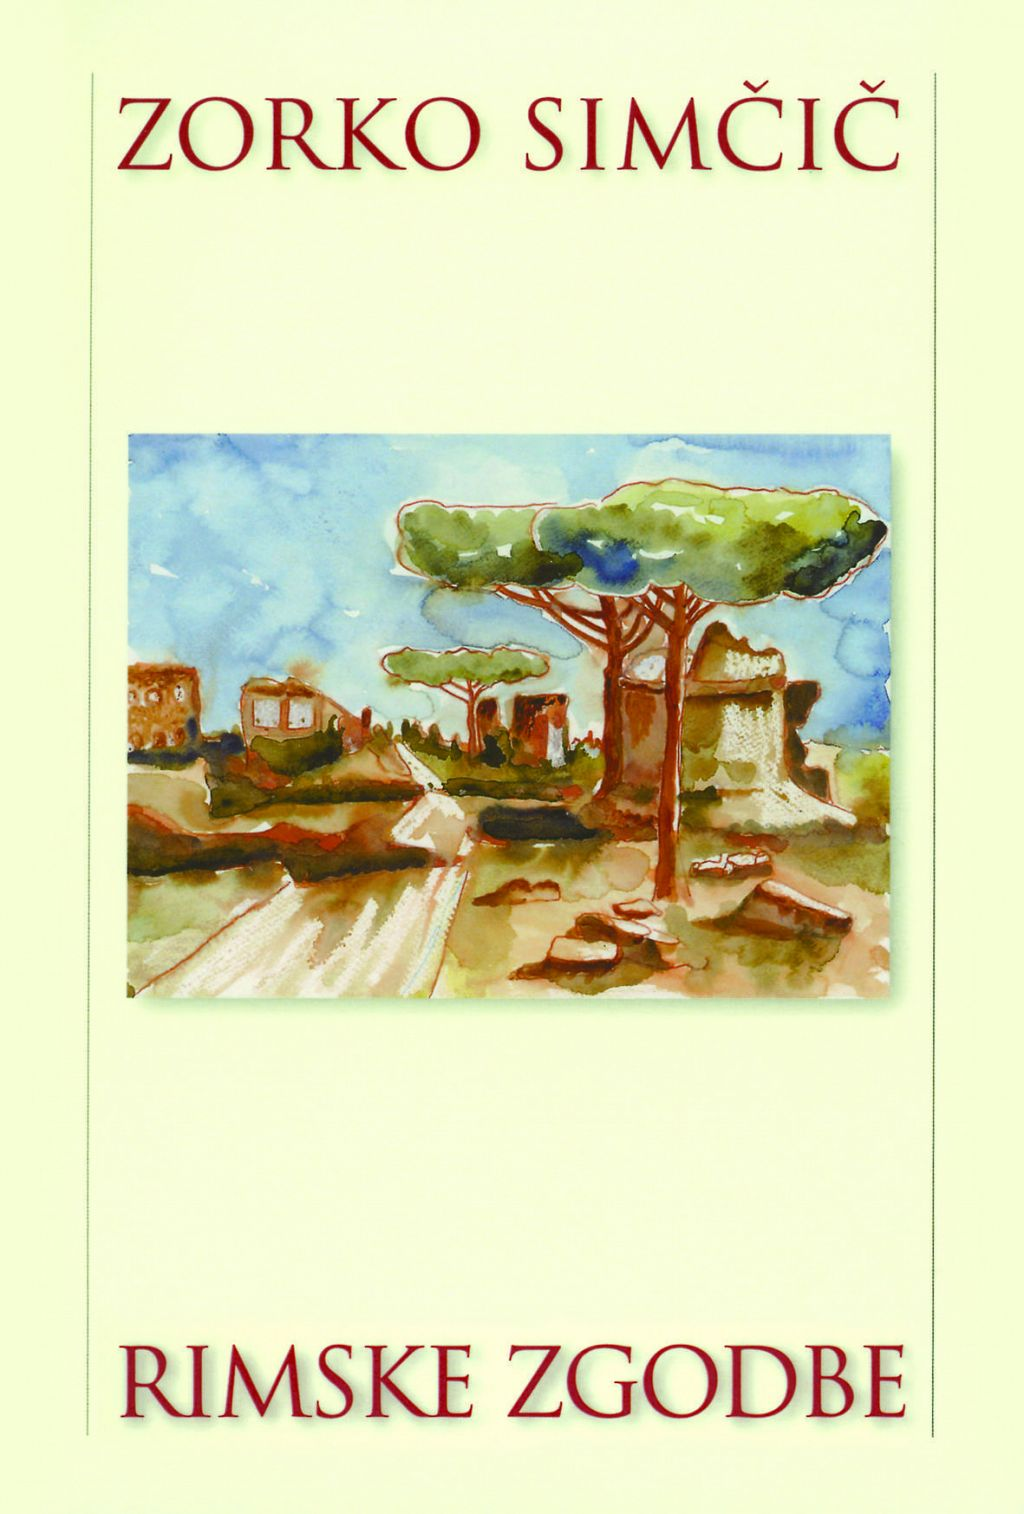 Rimske zgodbe